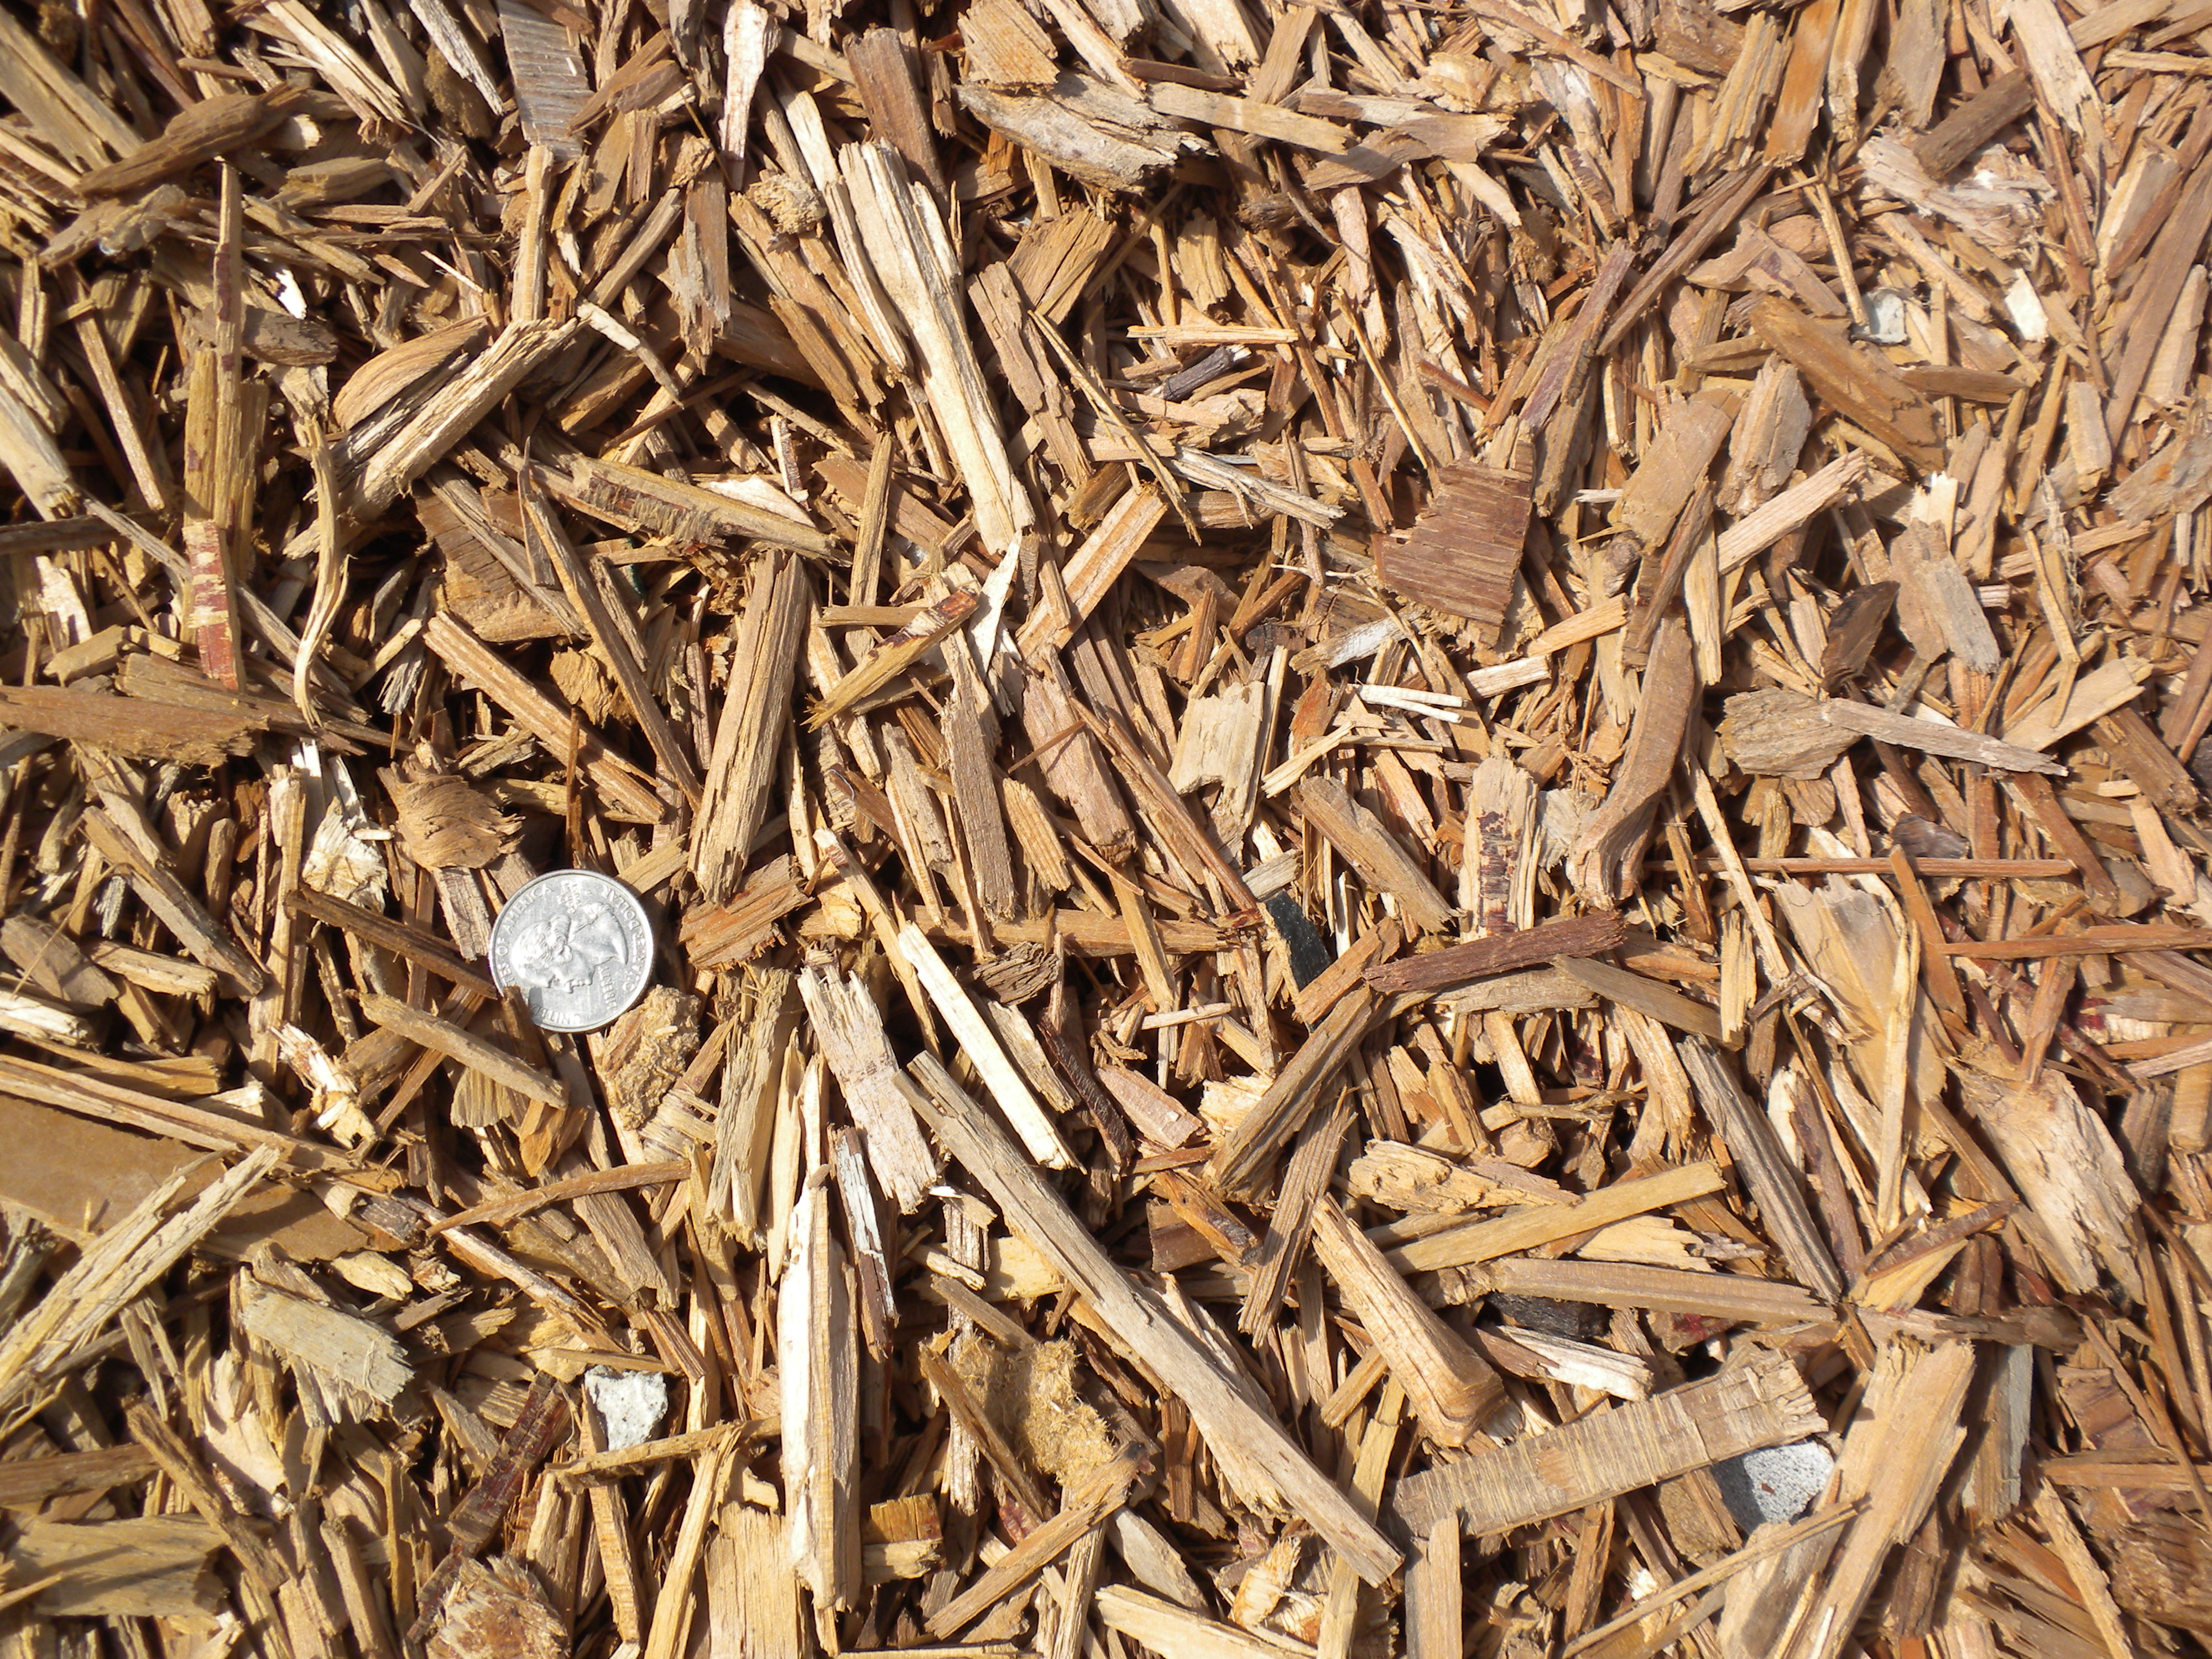 Wood chips mulch